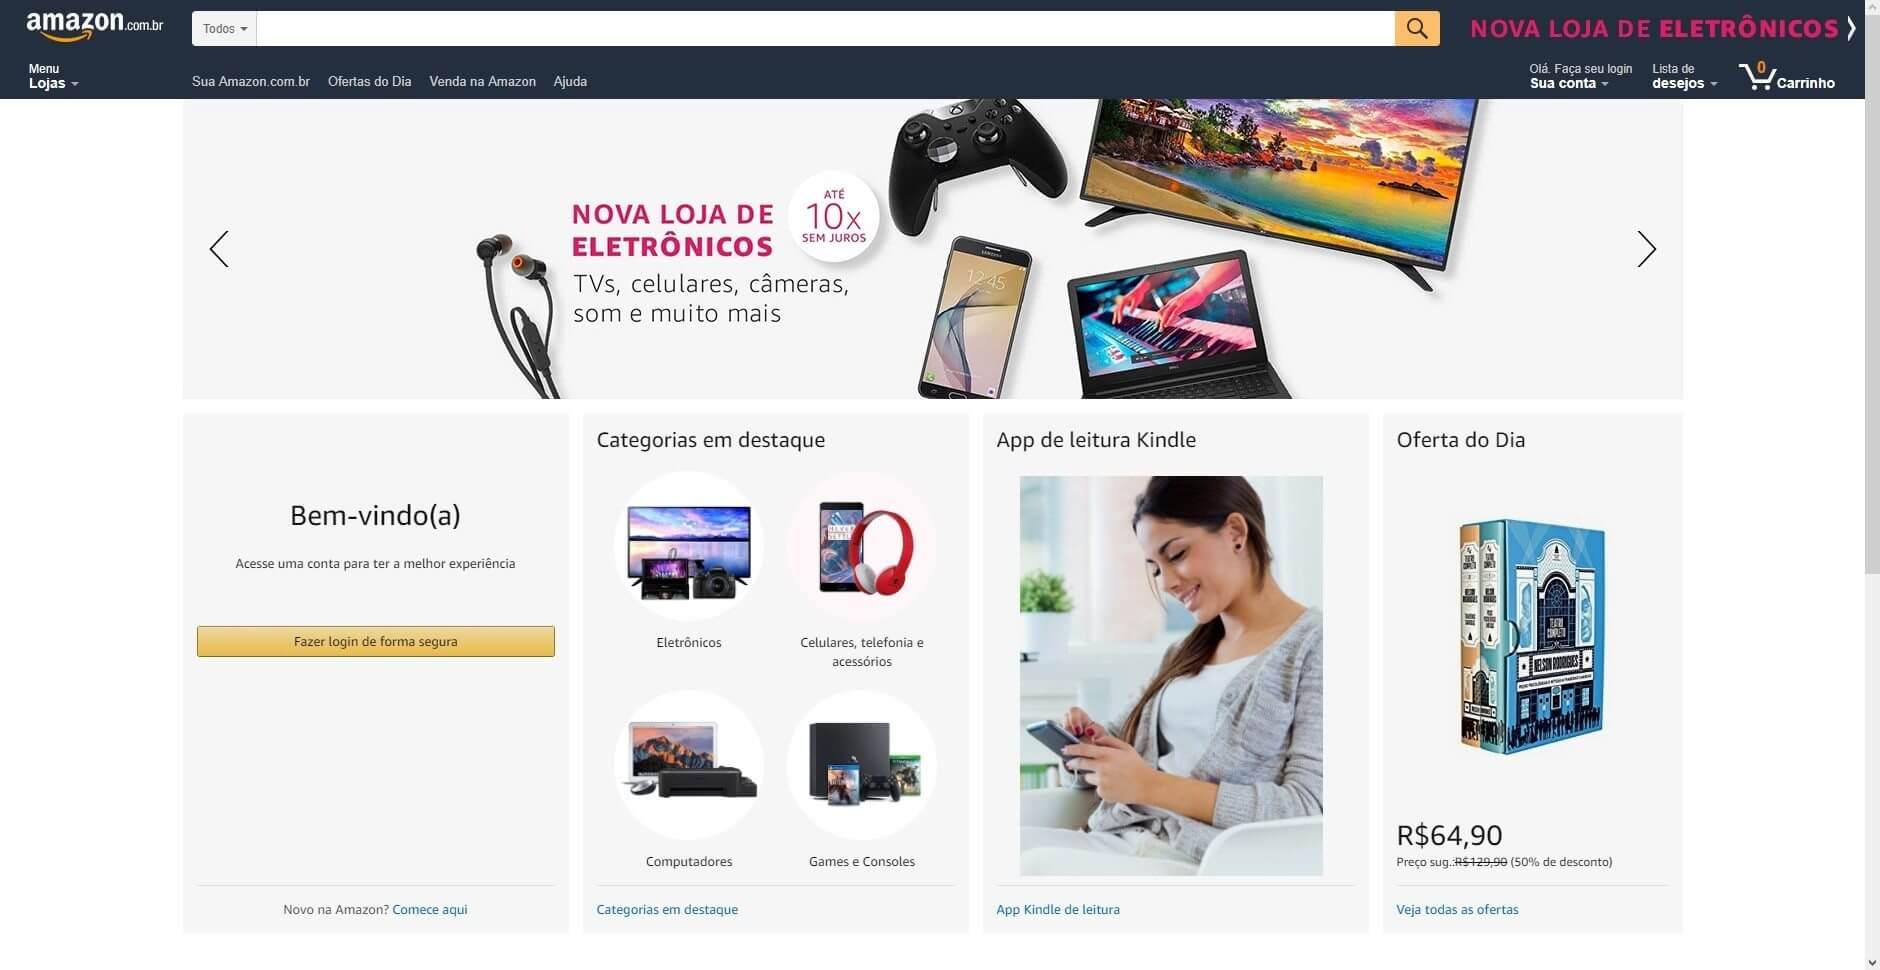 Amazon inicia vendas de eletrônicos no Brasil